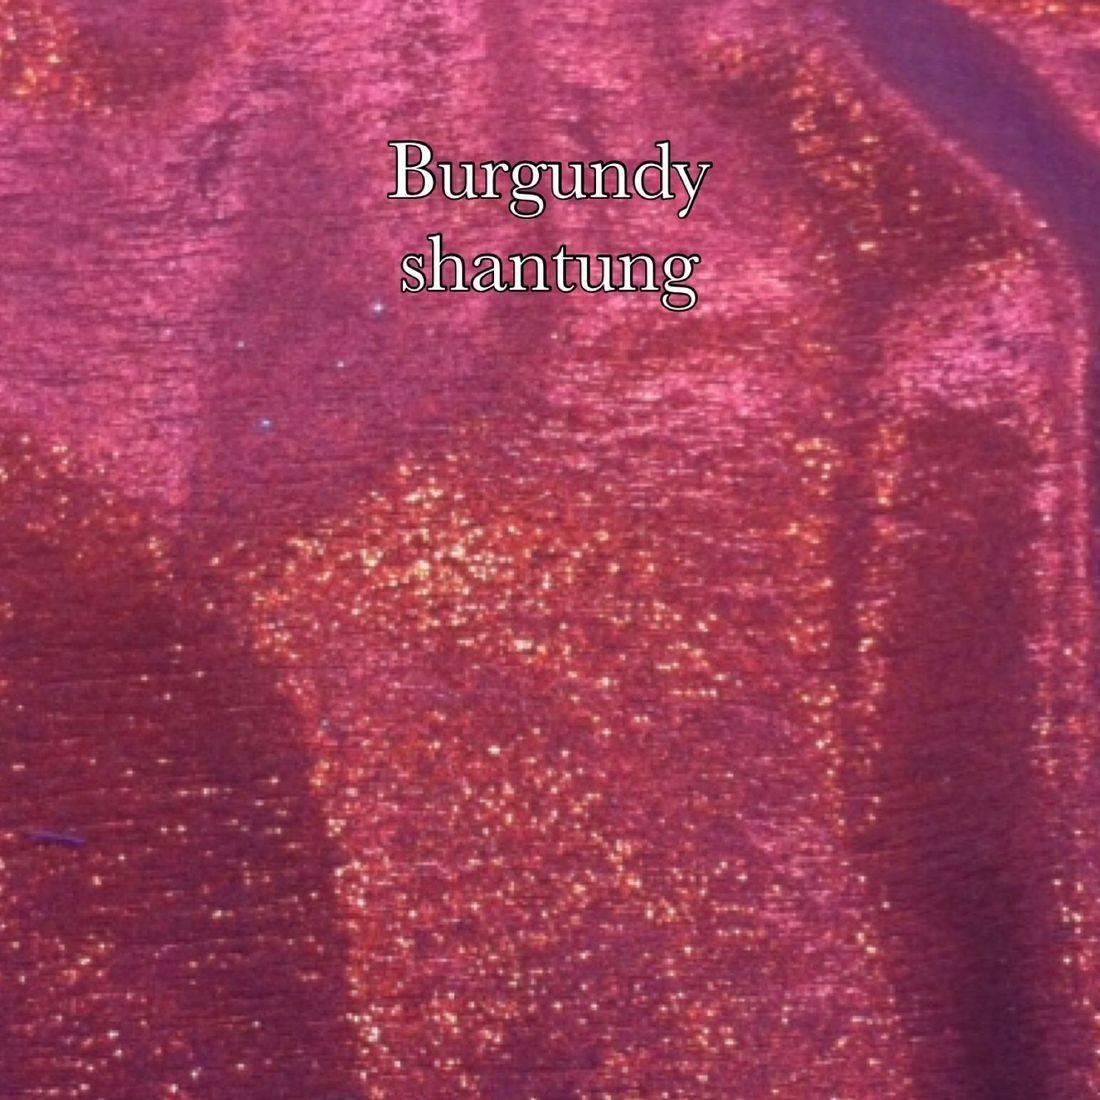 burgundy shantung